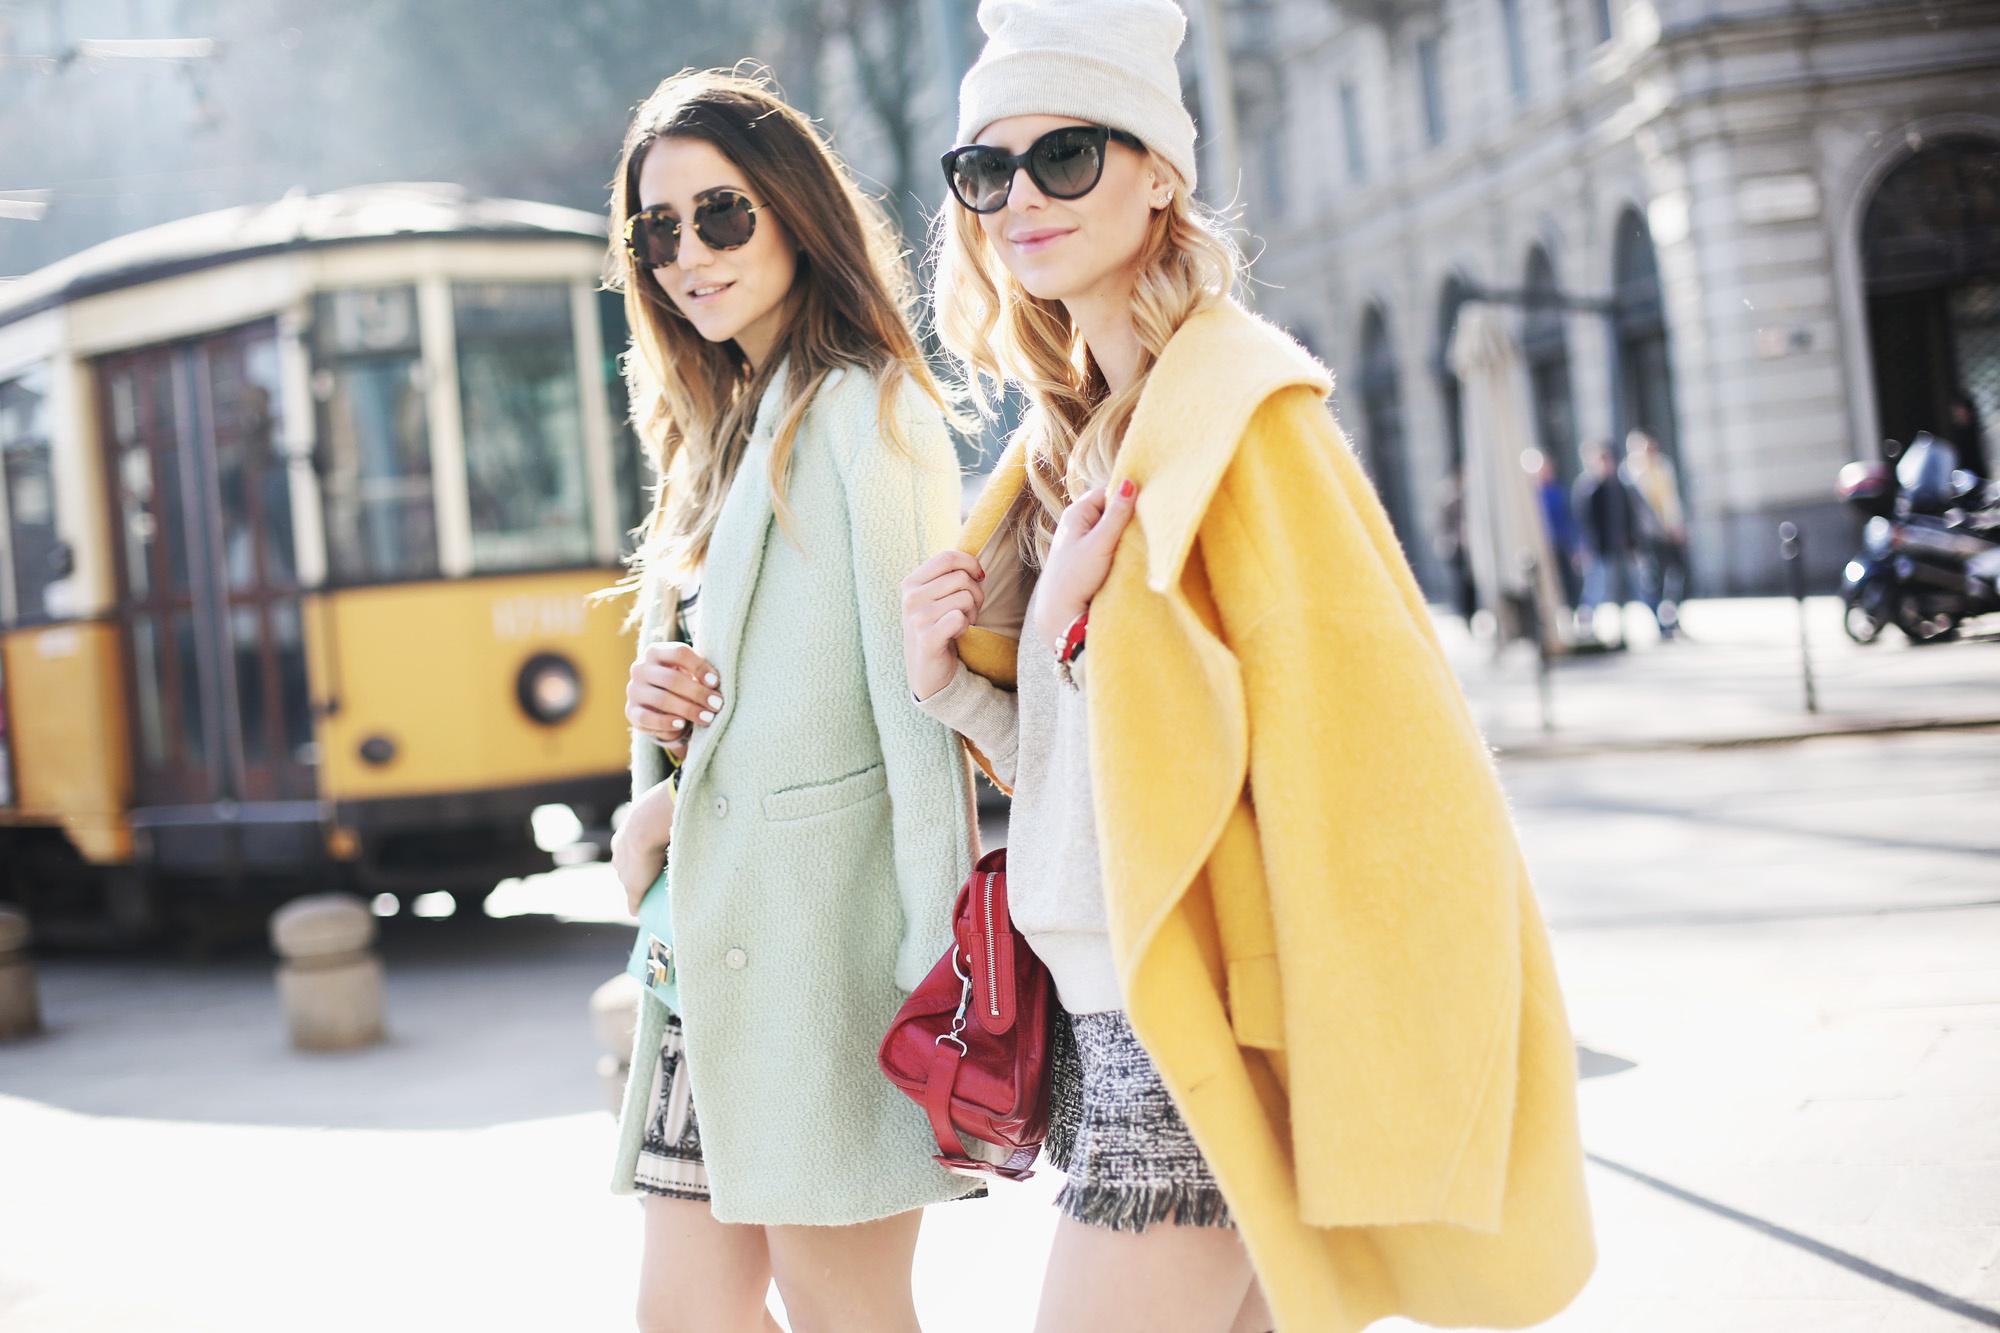 street style en milan spring print 884670239 2000x1333